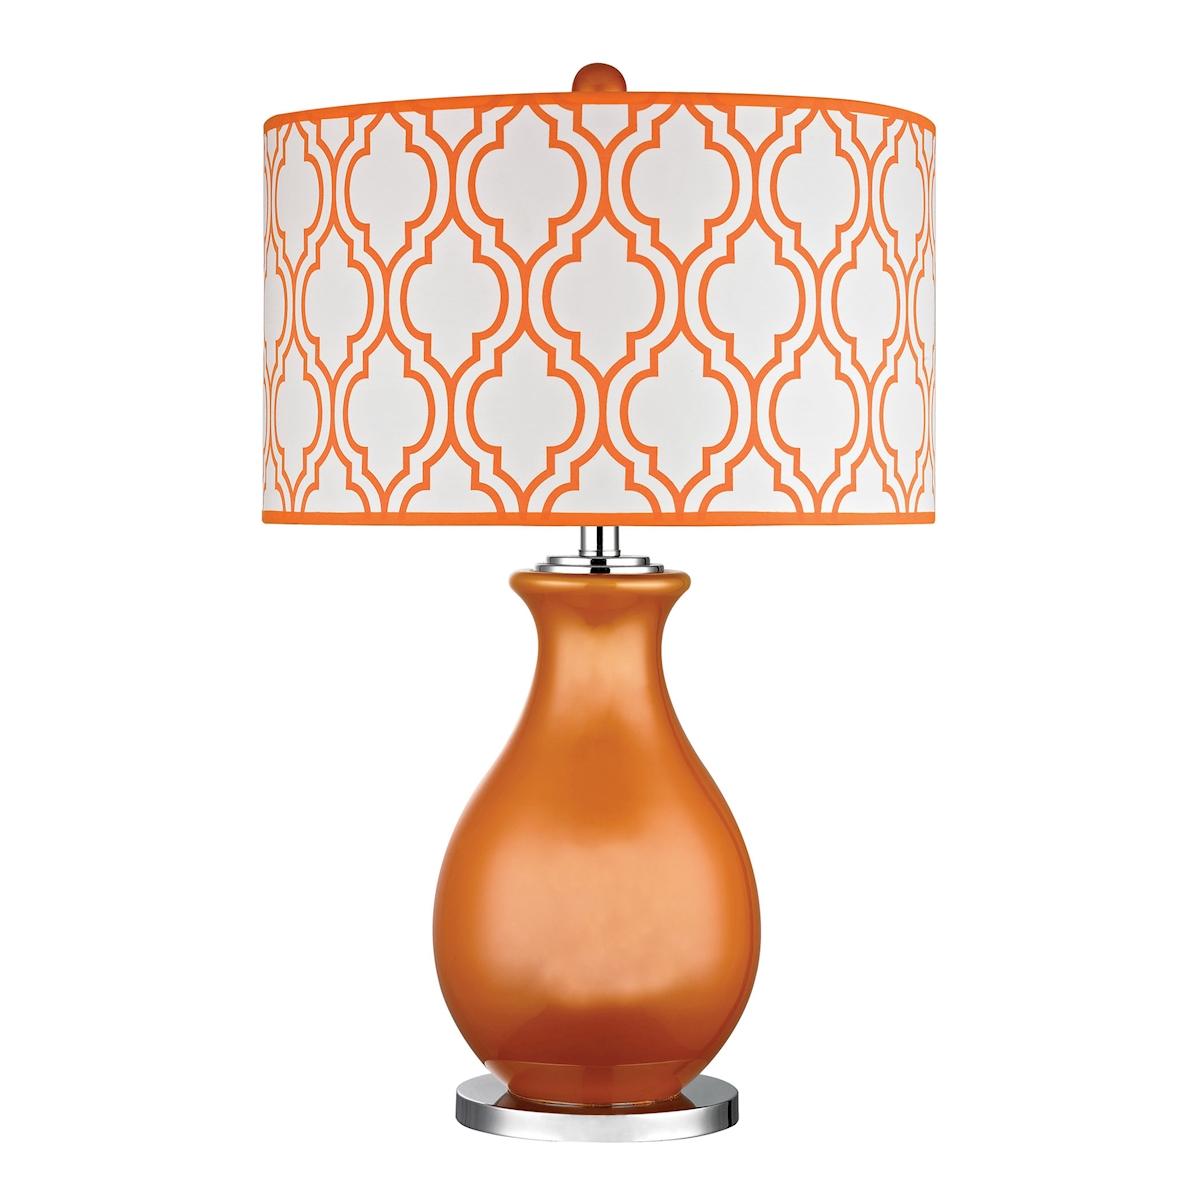 Dimond Thatcham 26 Glass Table Lamp in Tangerine Orange